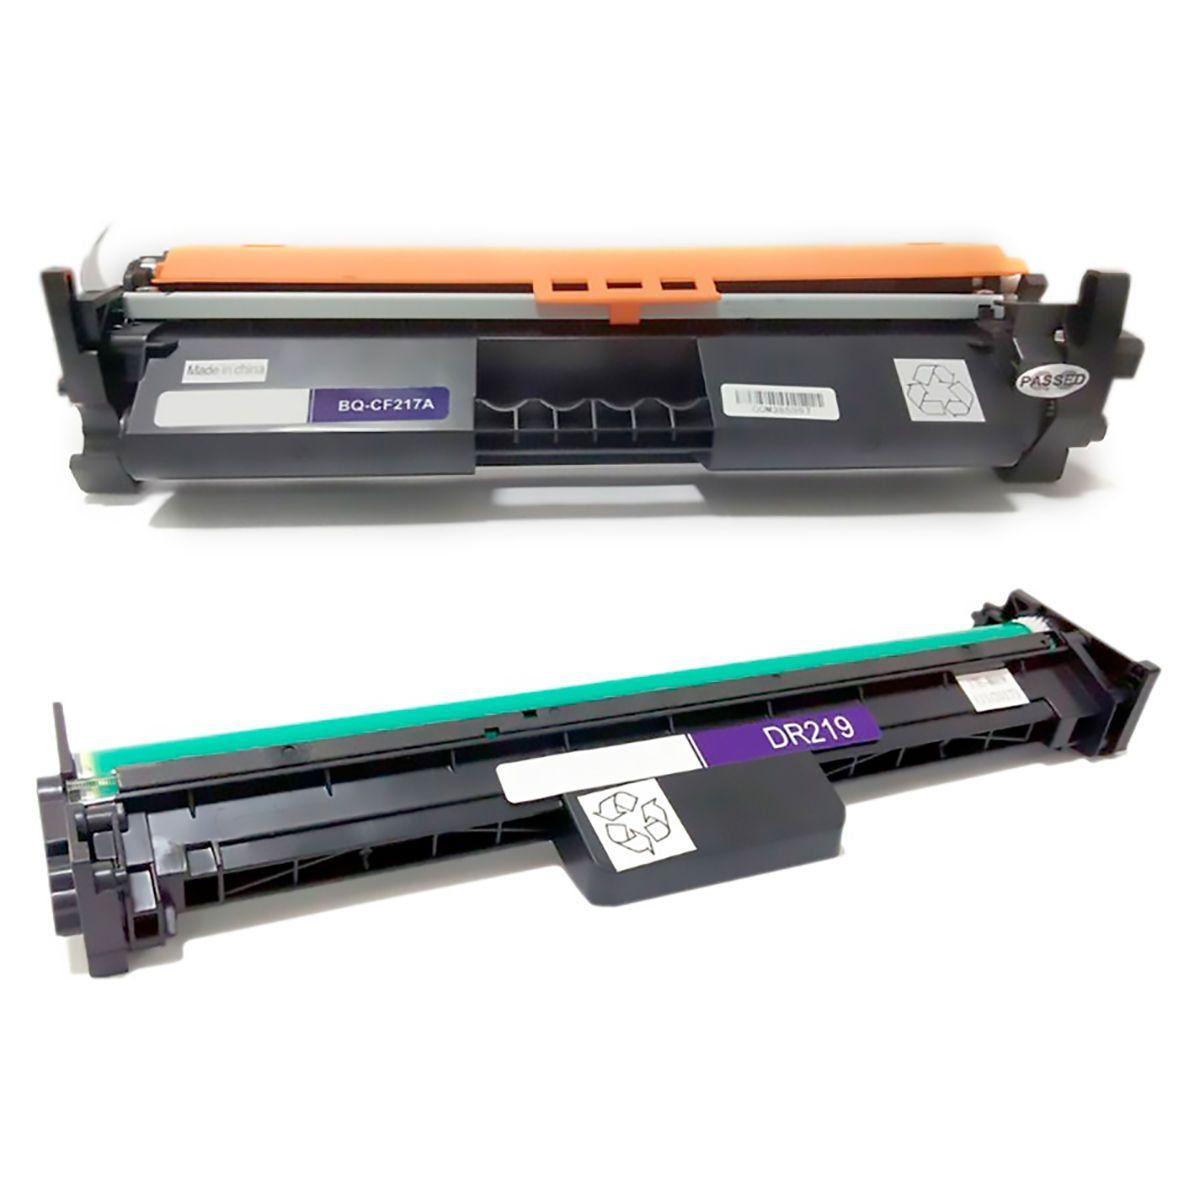 Compatível: Combo Fotocondutor CF-219 + Toner CF-217A para HP M102 M102a M102w M130 M130fn M130fw M130nw